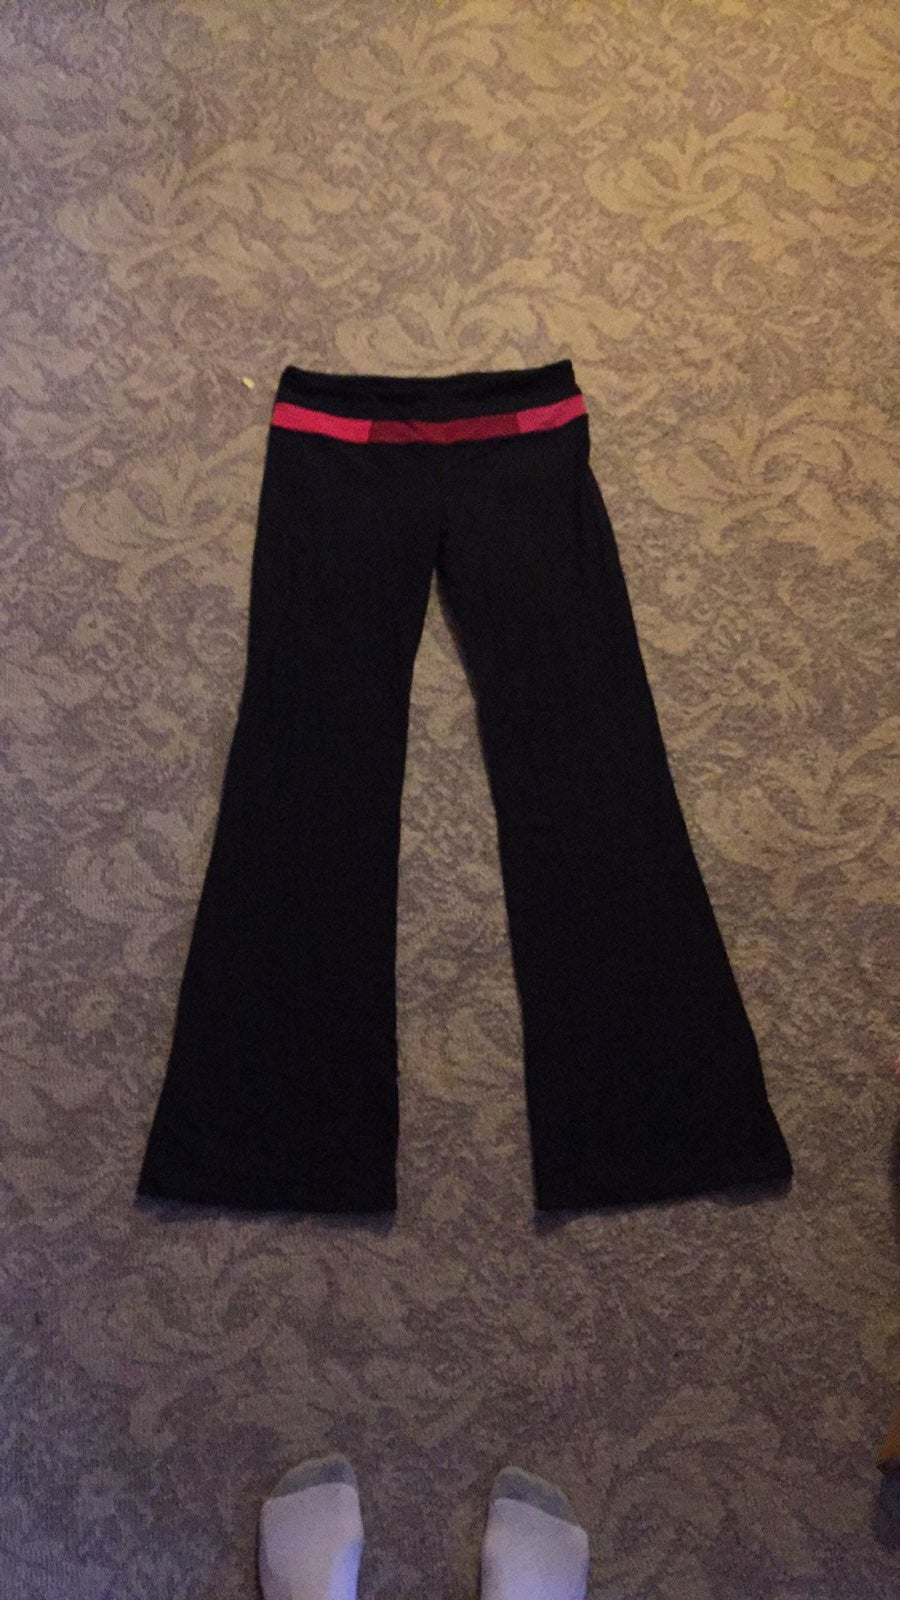 Lululemon size 8 Yoga pants